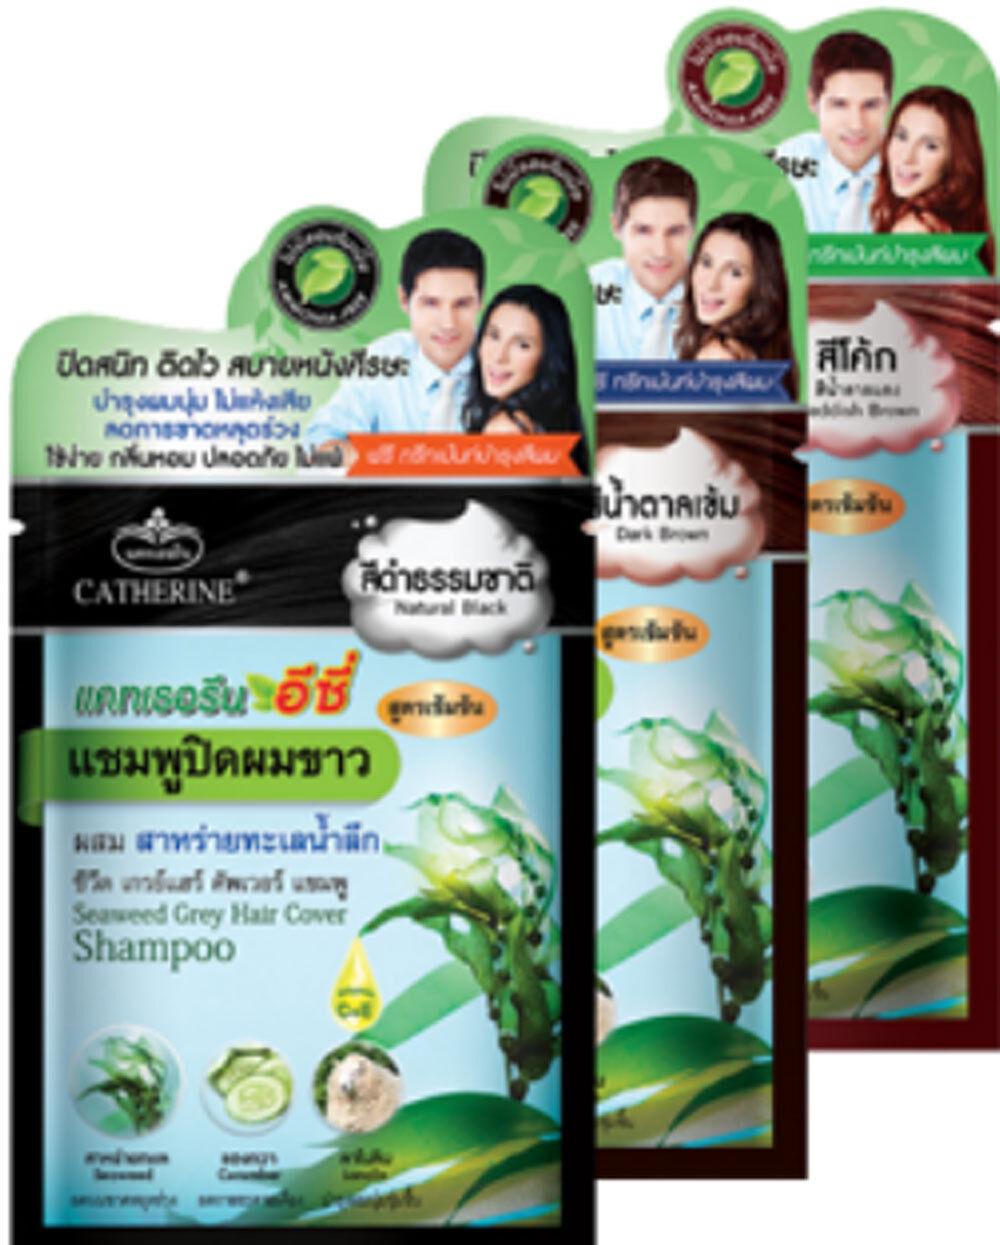 2×25 Ml Catherine Ezi Deep Seaweed Grey Hair Cover Coloring Shampoo Vitamin C